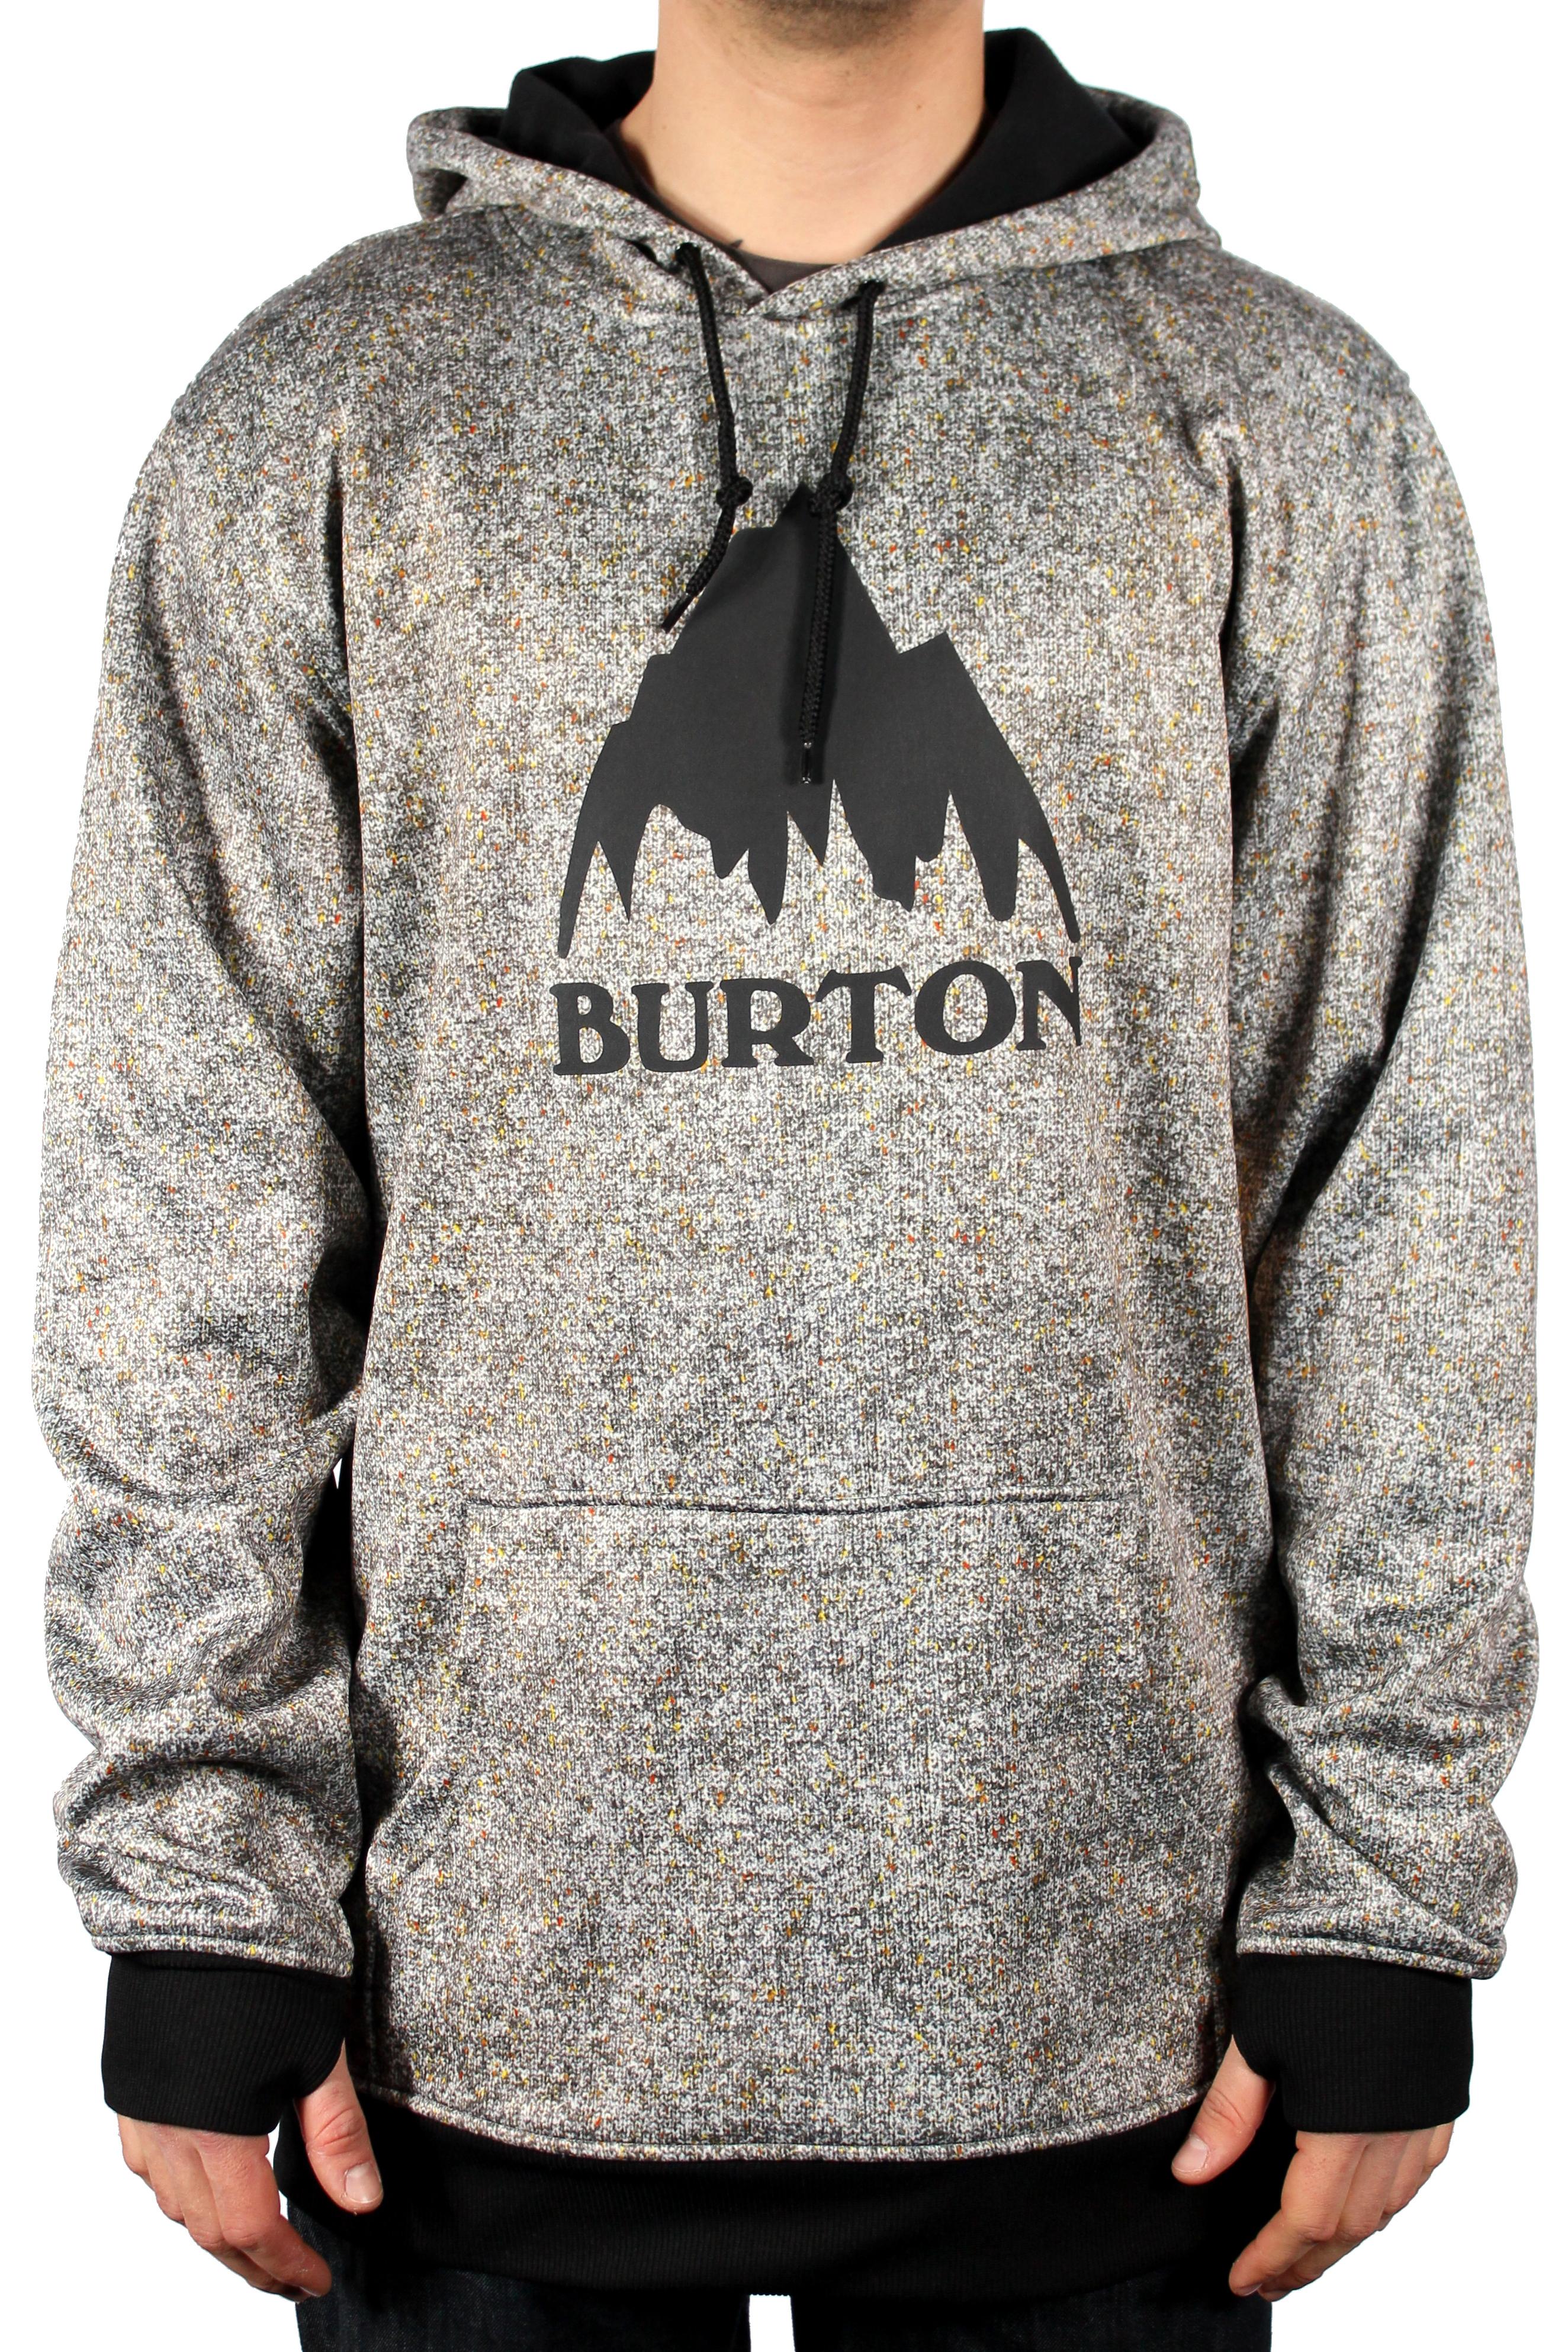 Bluza Aktywna Burton Crown Bonded (Sweater Nepp)